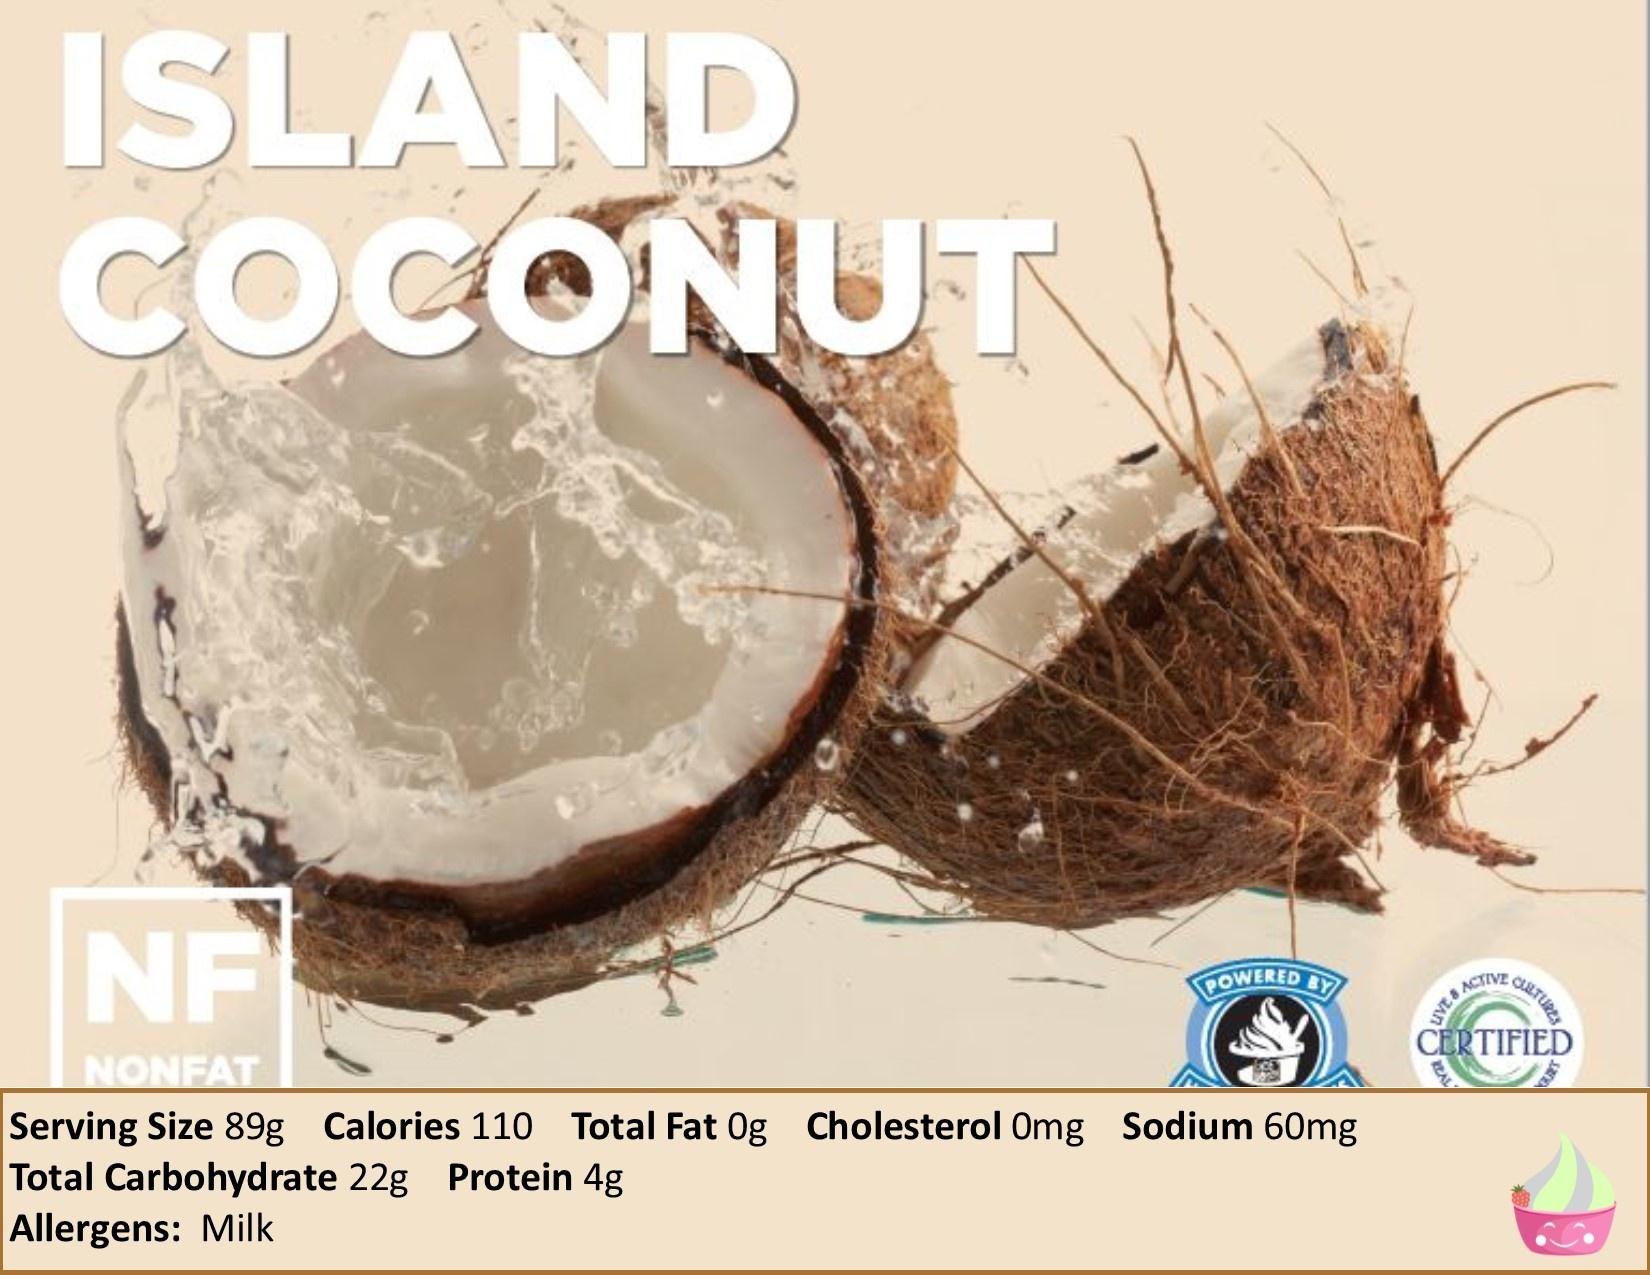 https://0201.nccdn.net/1_2/000/000/0a0/a1b/Island-Coconut-NF-1650x1275-1650x1275.jpg